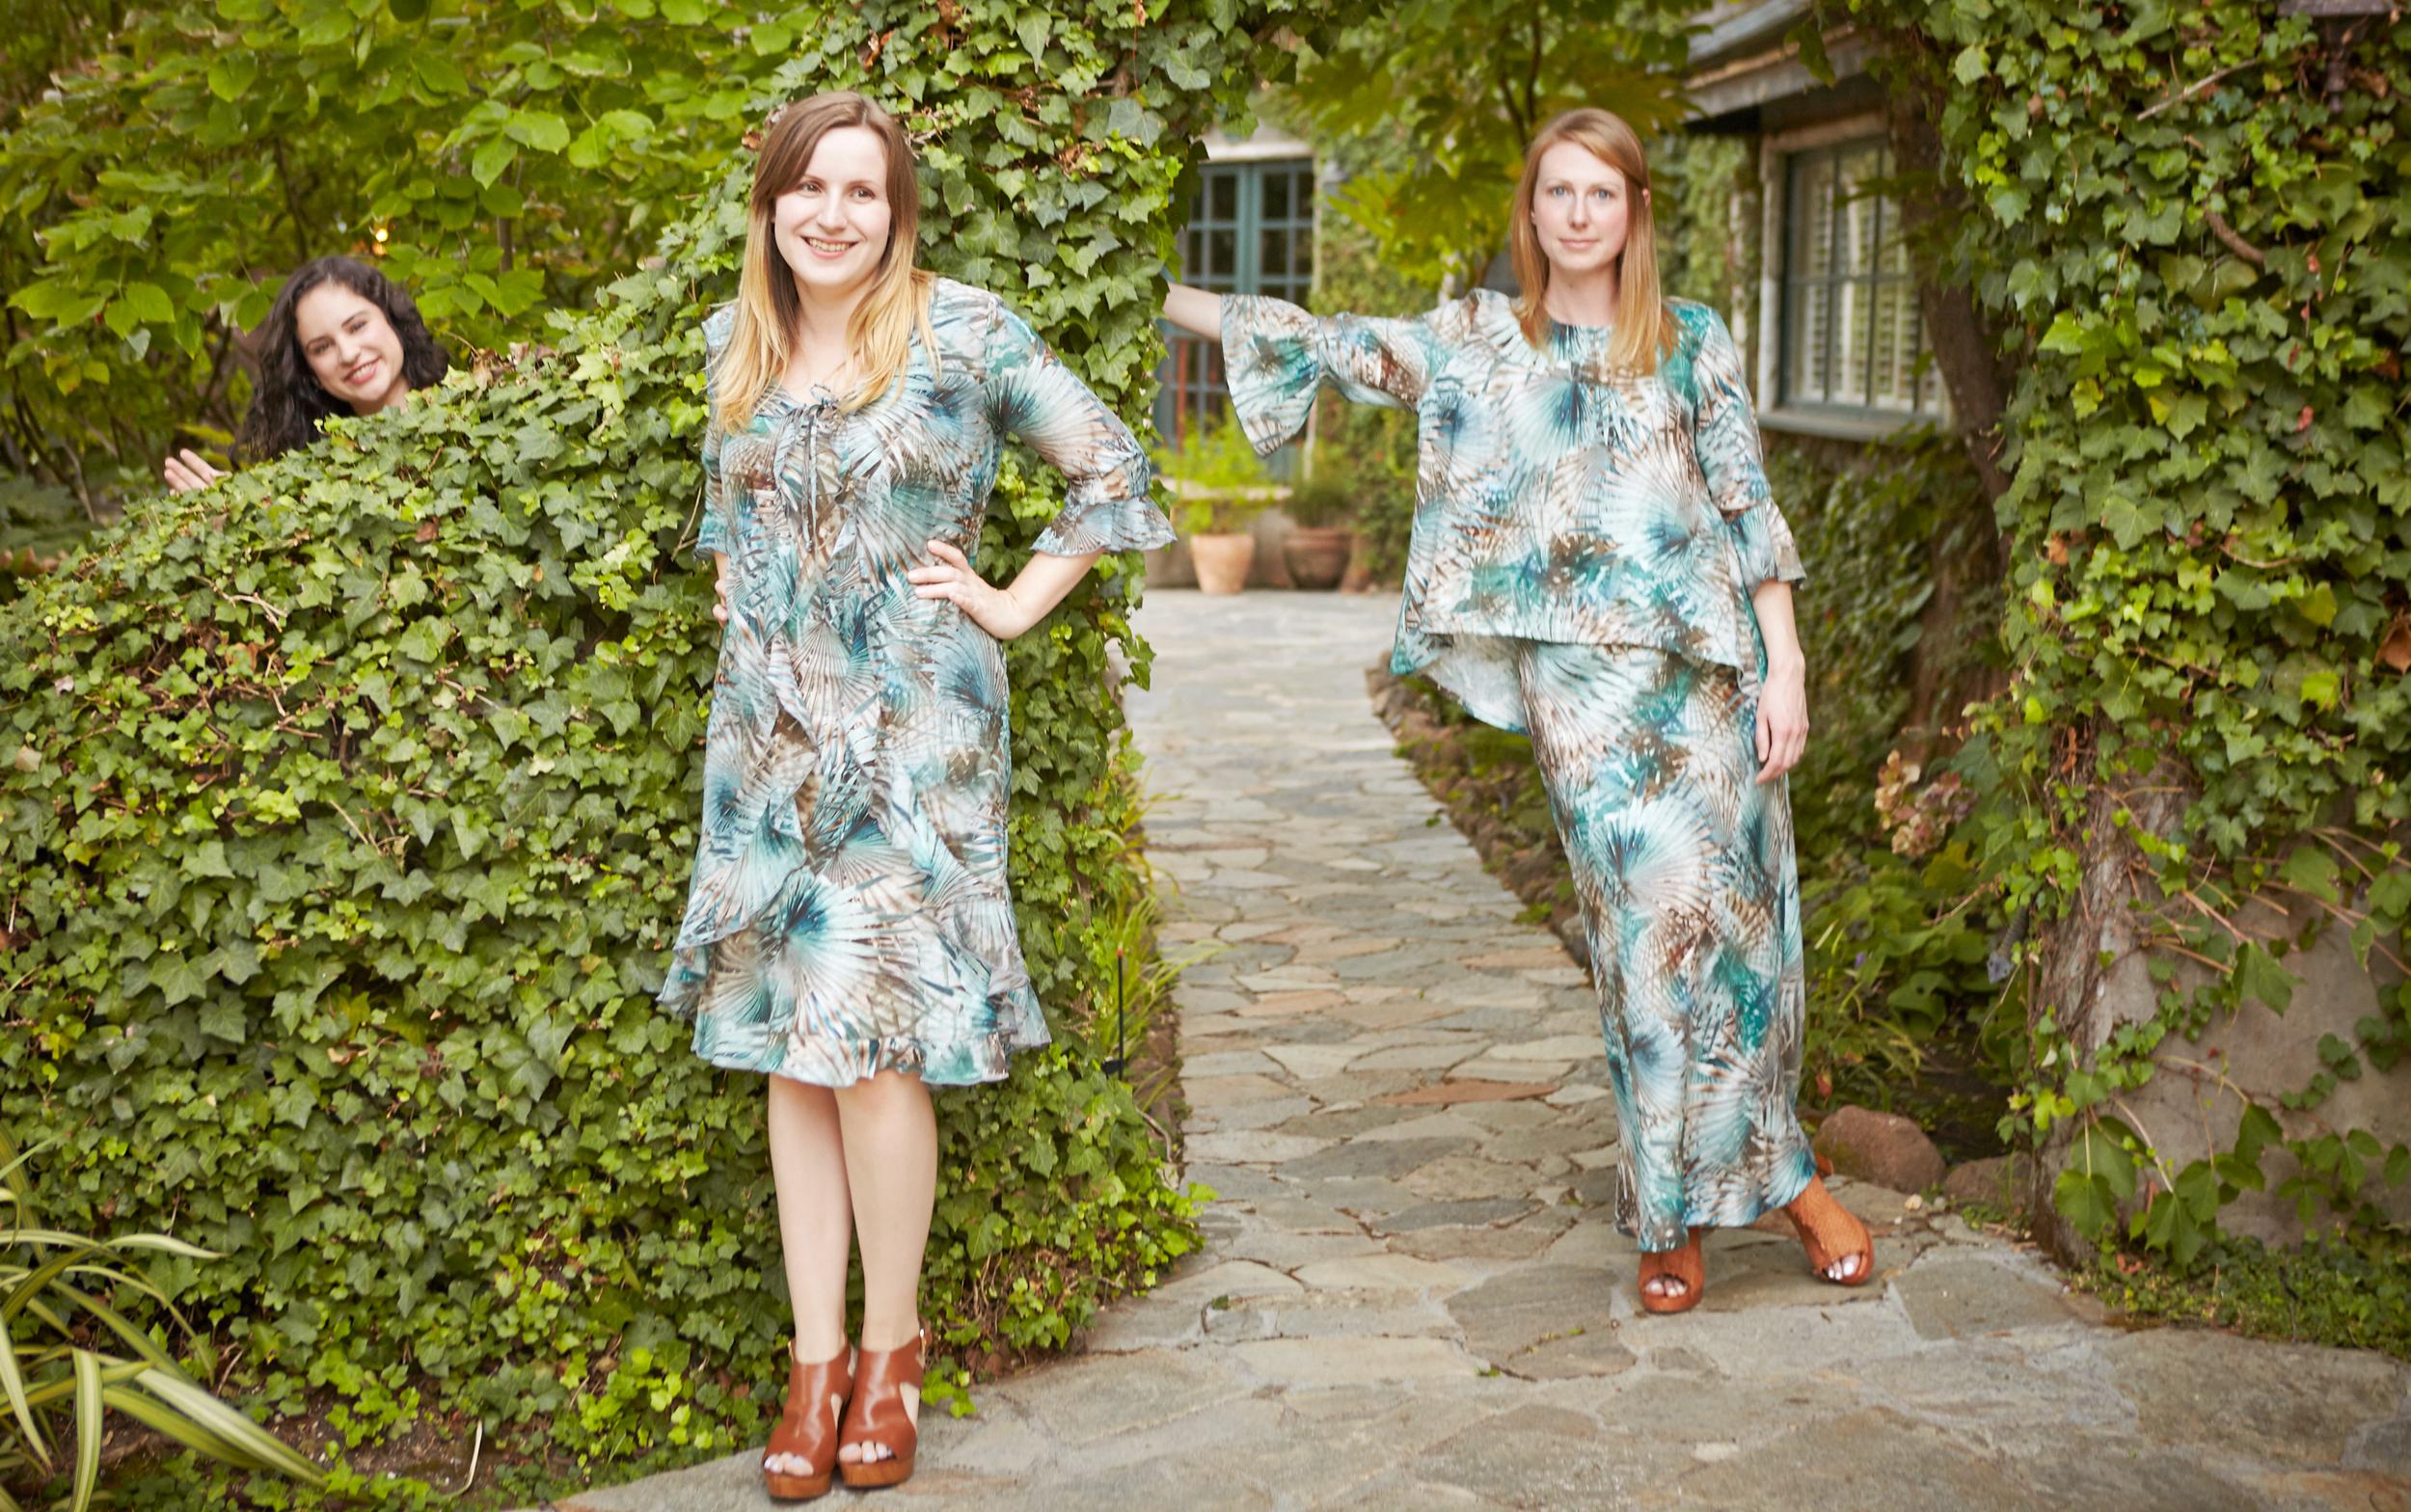 Camille Cardigan in Palma Italian Cotton/Silk, Giselle Dress, Fran Shirt,Long Bias Skirt in Palma Italian Linen